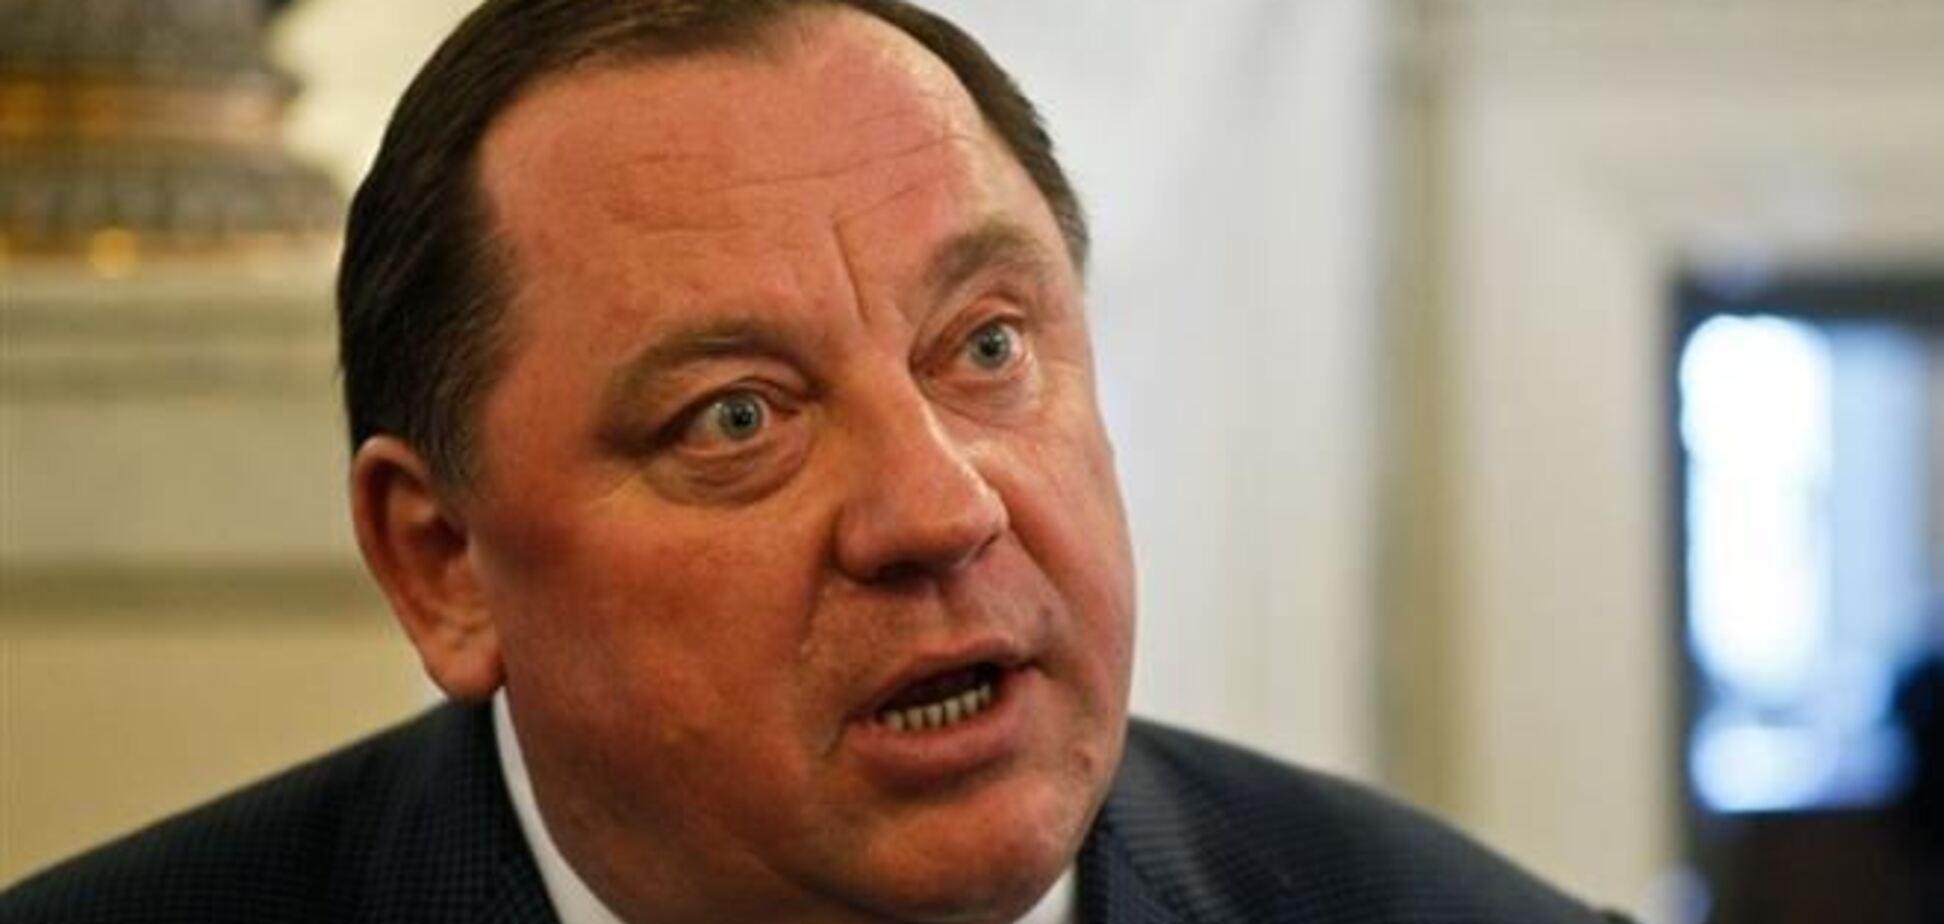 Суд назначил экс-ректору Мельнику 23 млн грн залога